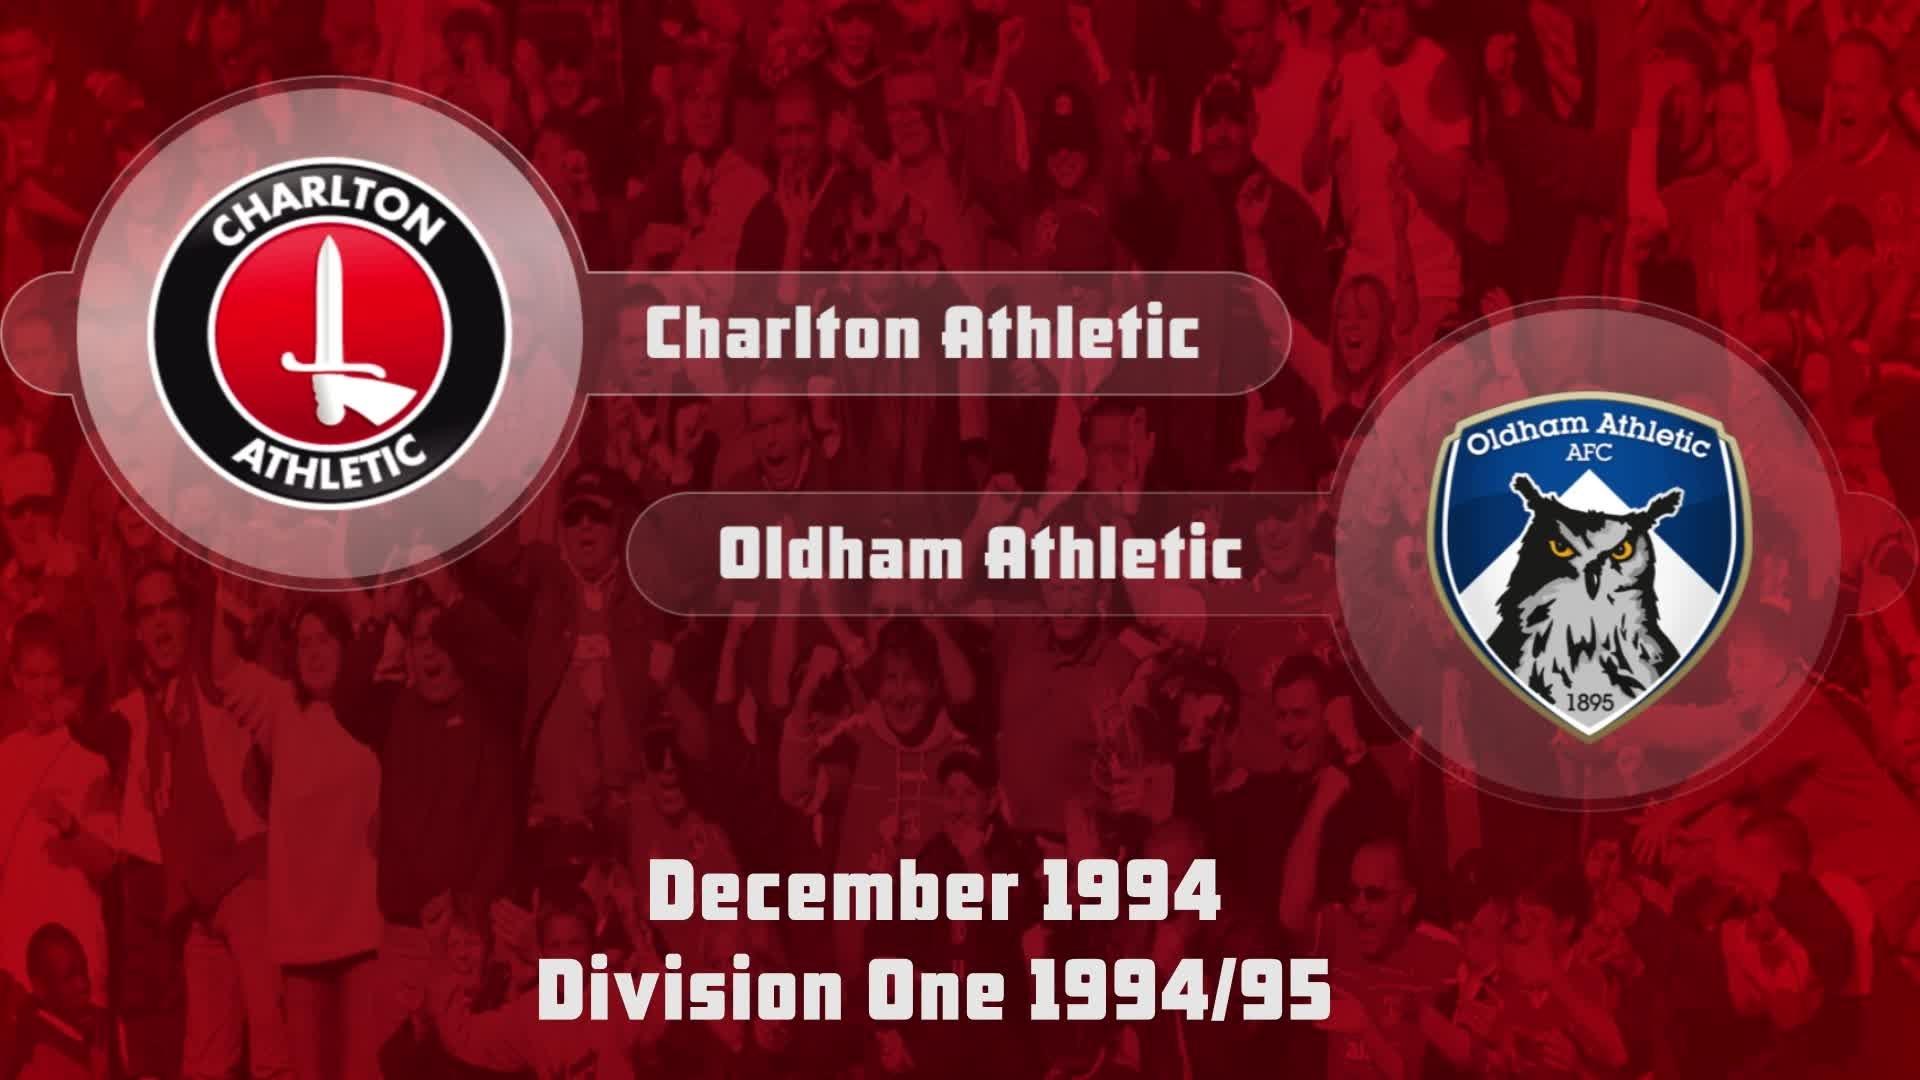 23 HIGHLIGHTS | Charlton 2 Oldham 0 (Dec 1994)